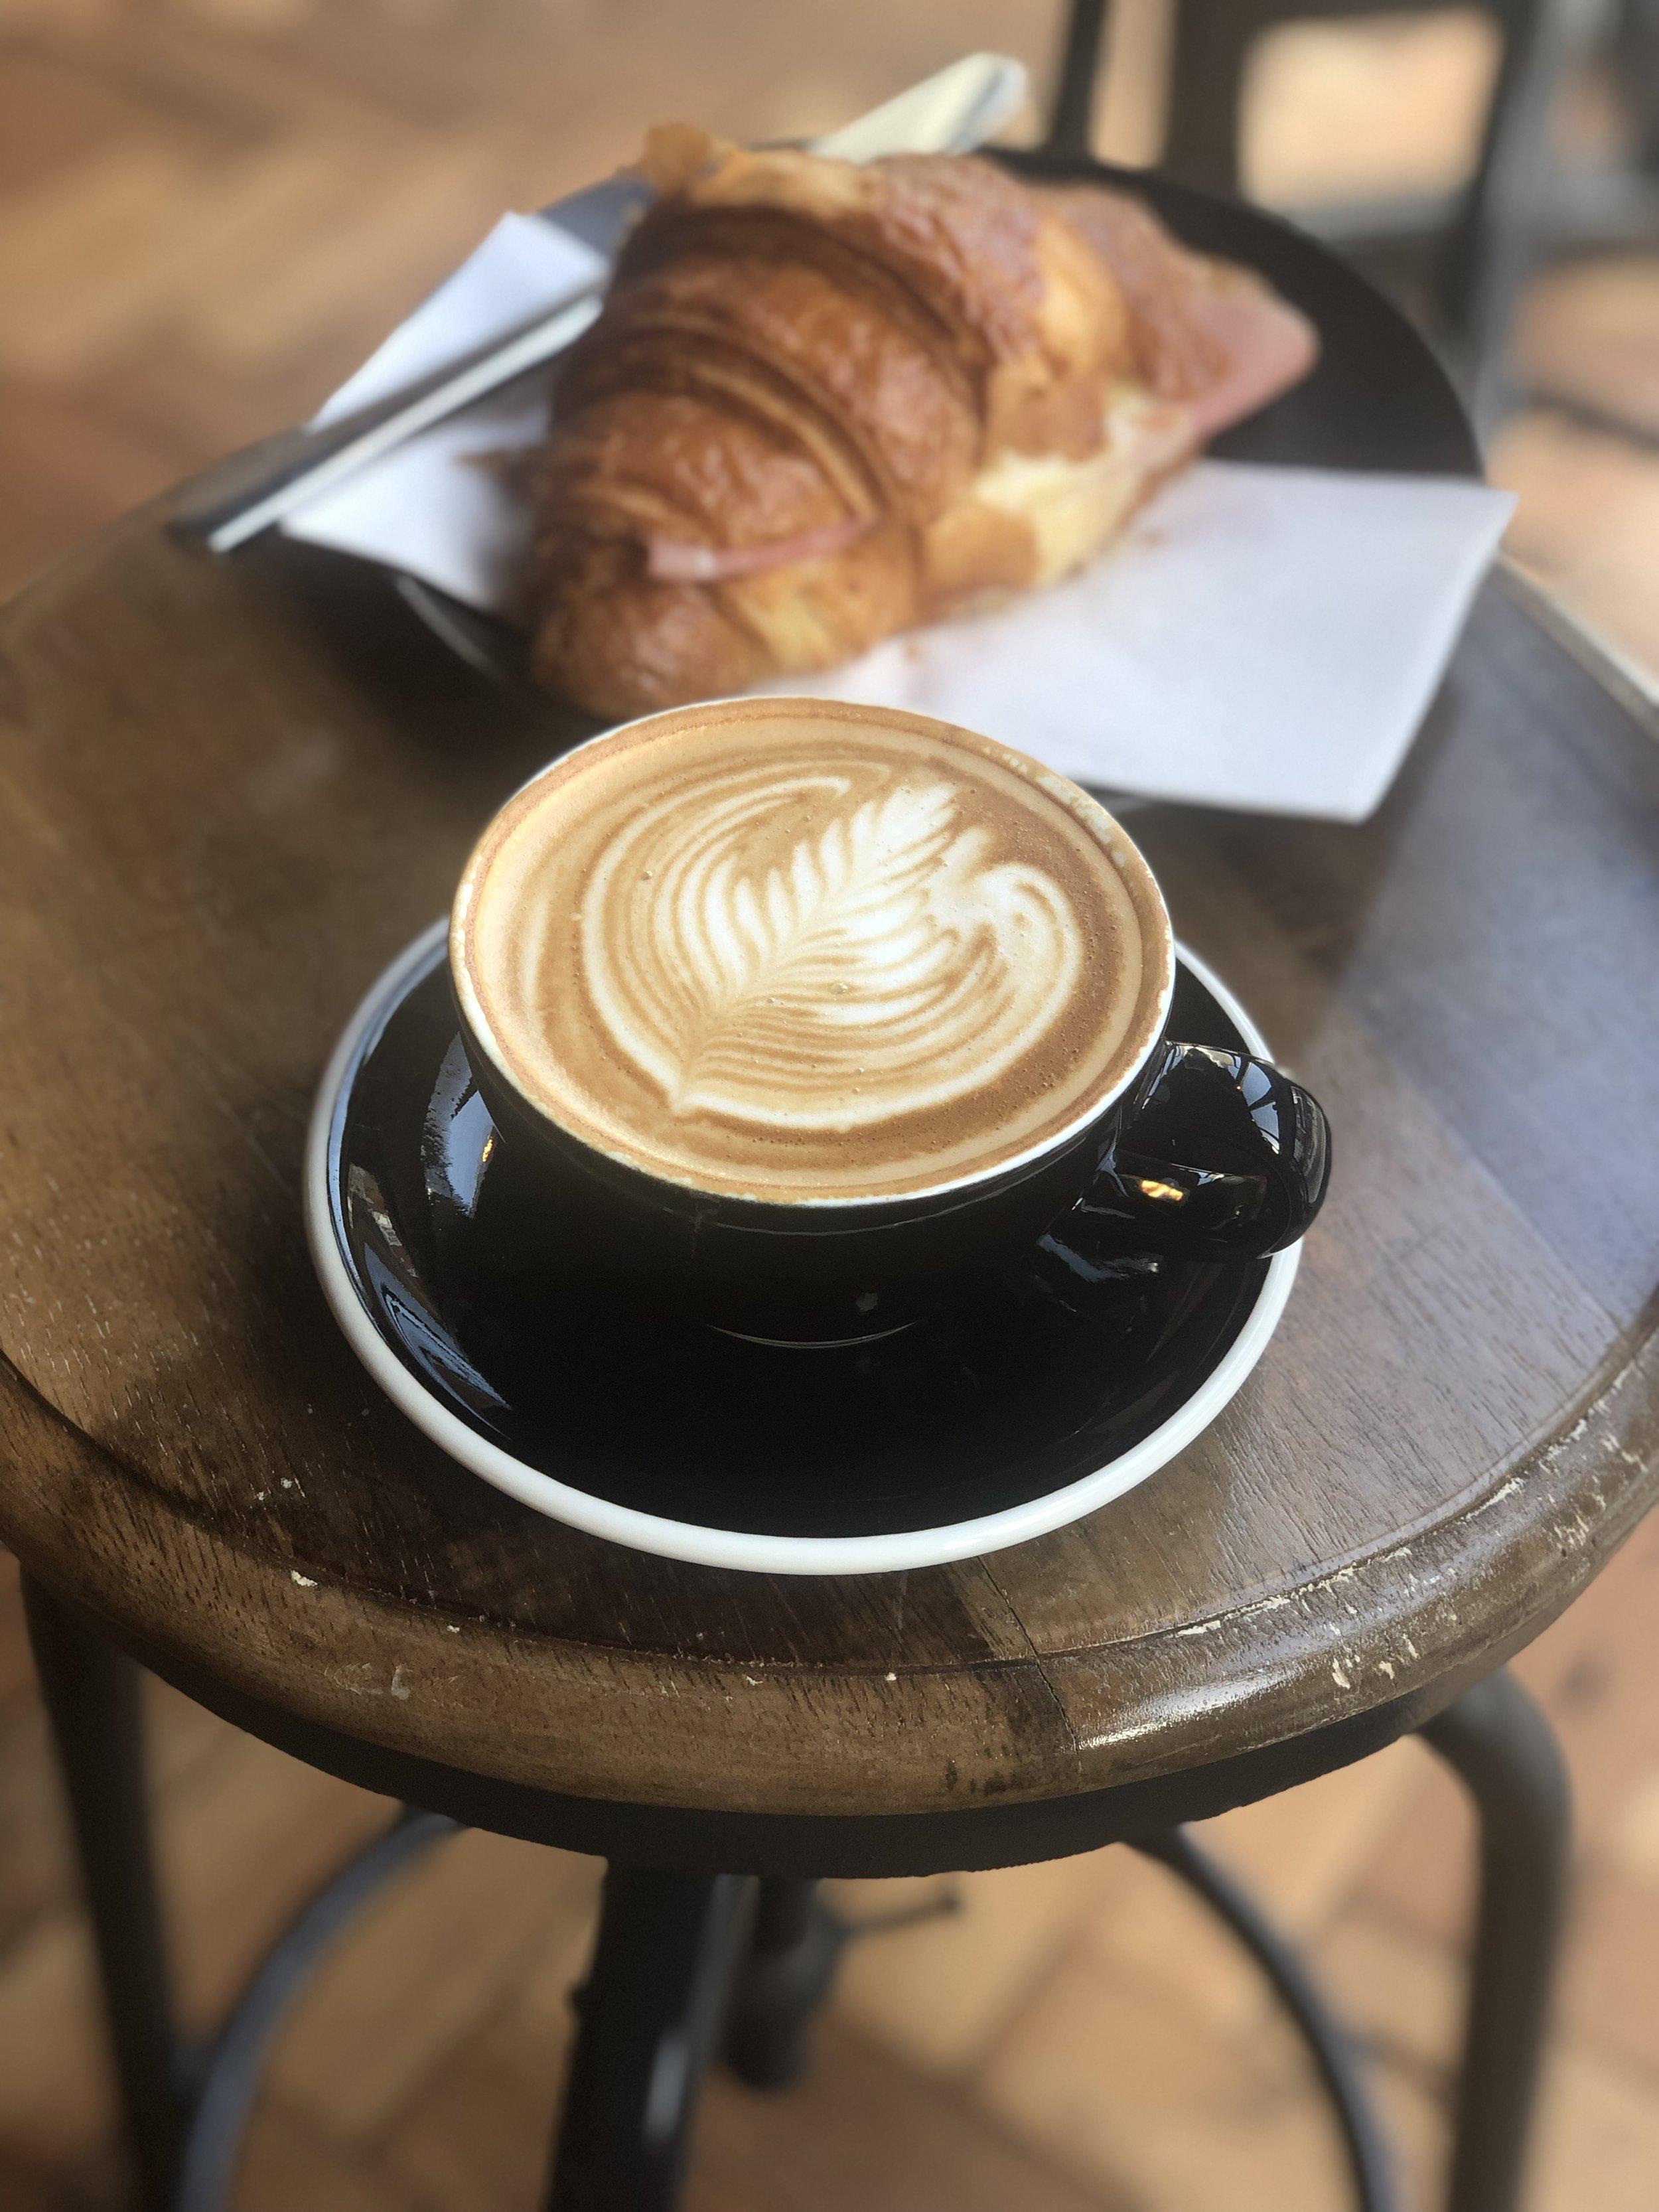 ALLPRESS COFFEE + ESTATE DAIRY MILK + VERY GOOD BARISTA = GREAT COFFEE + HAPPY TIMES